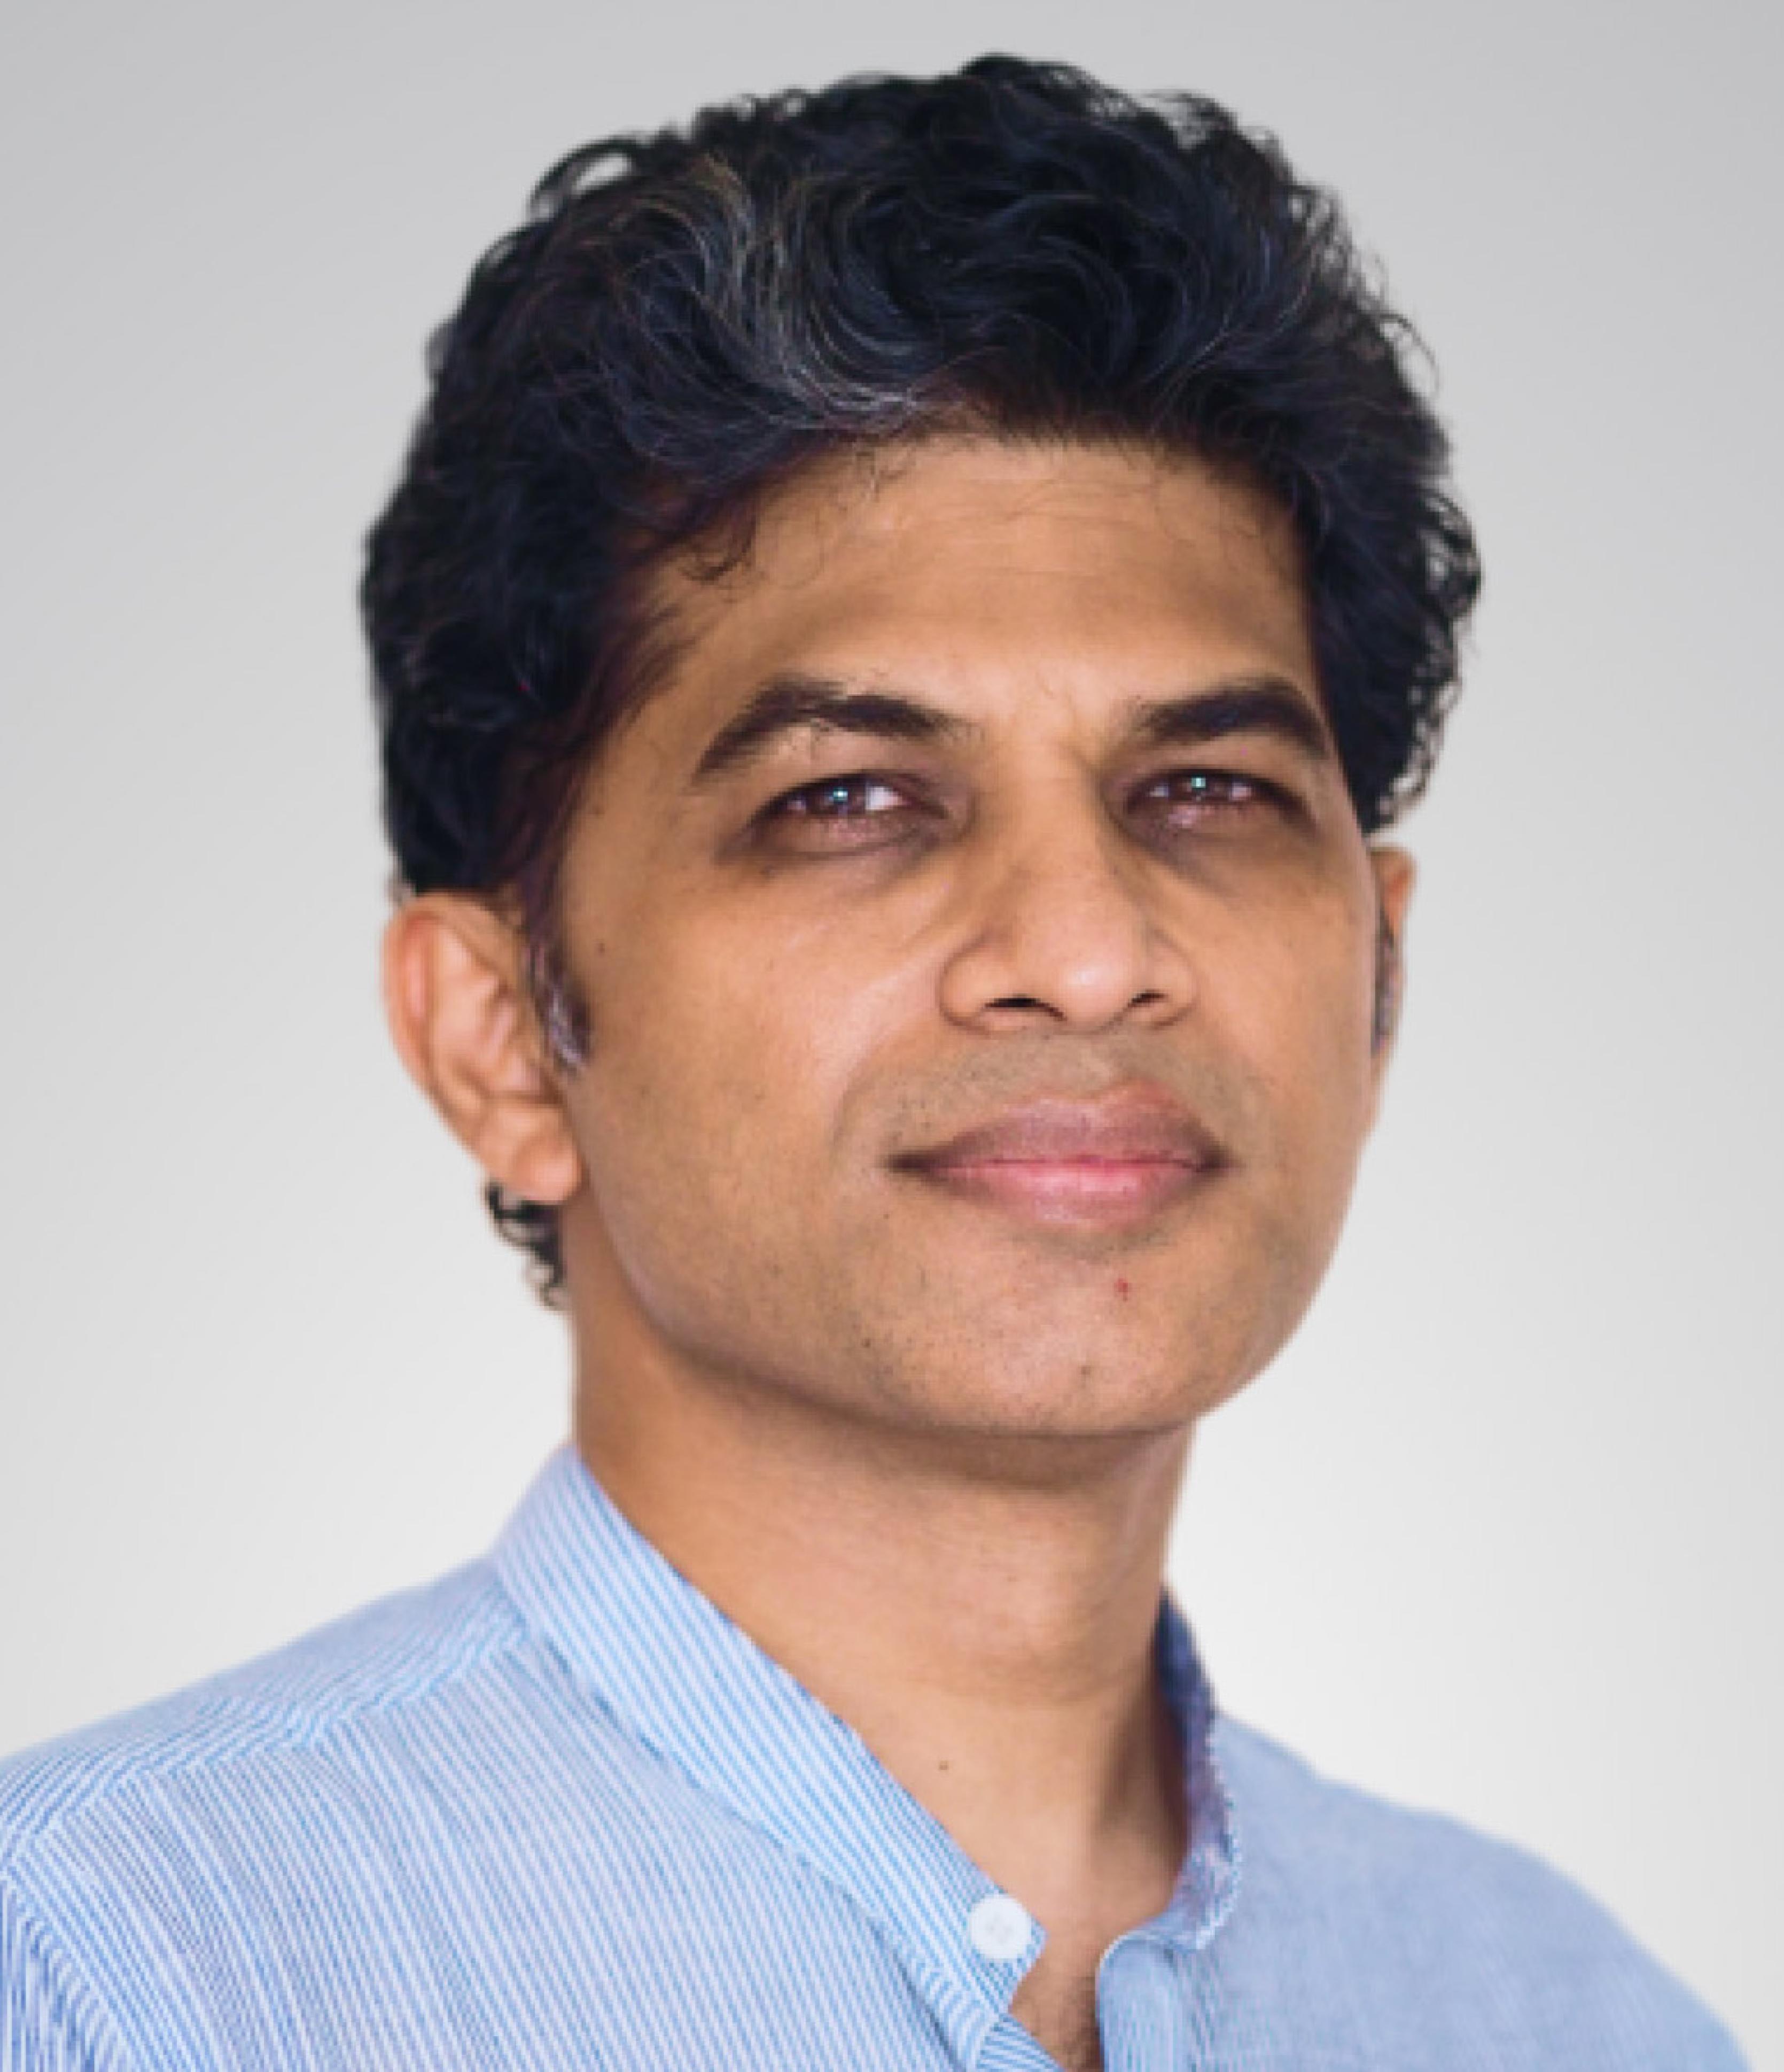 Siddharth Das, Founder and CEO, Univ.AI